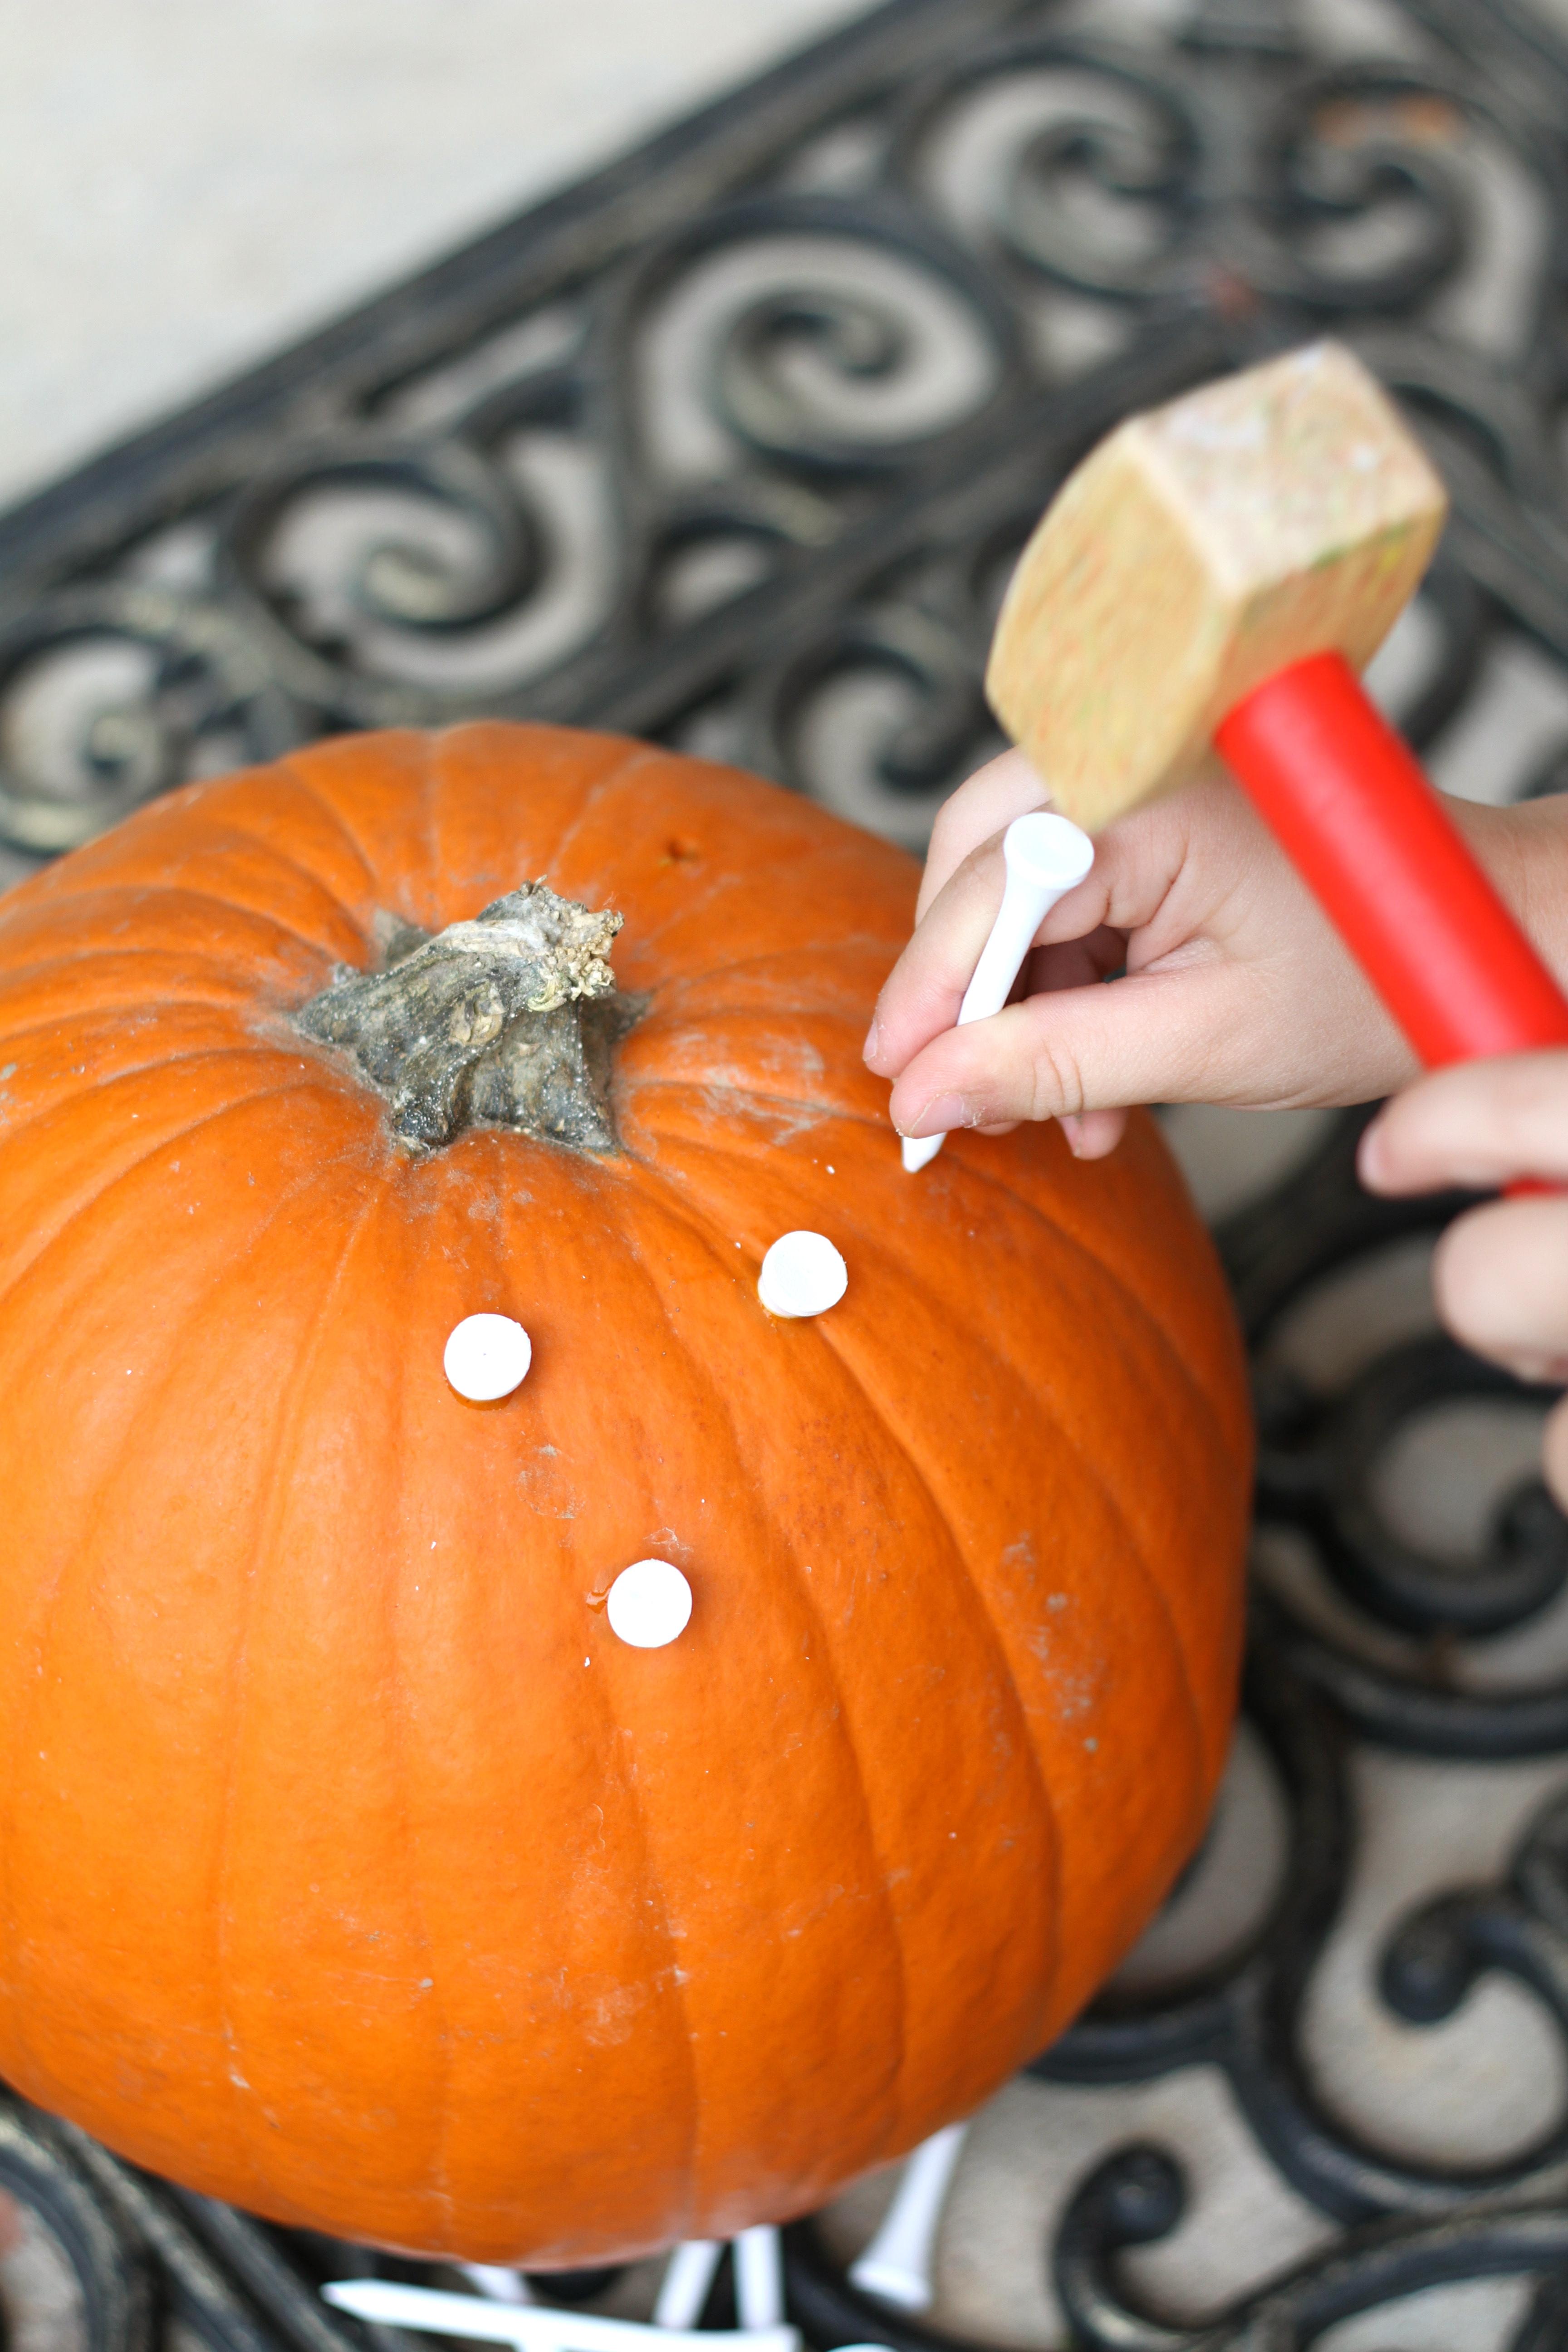 Pounding Golf Tees Into A Pumpkin